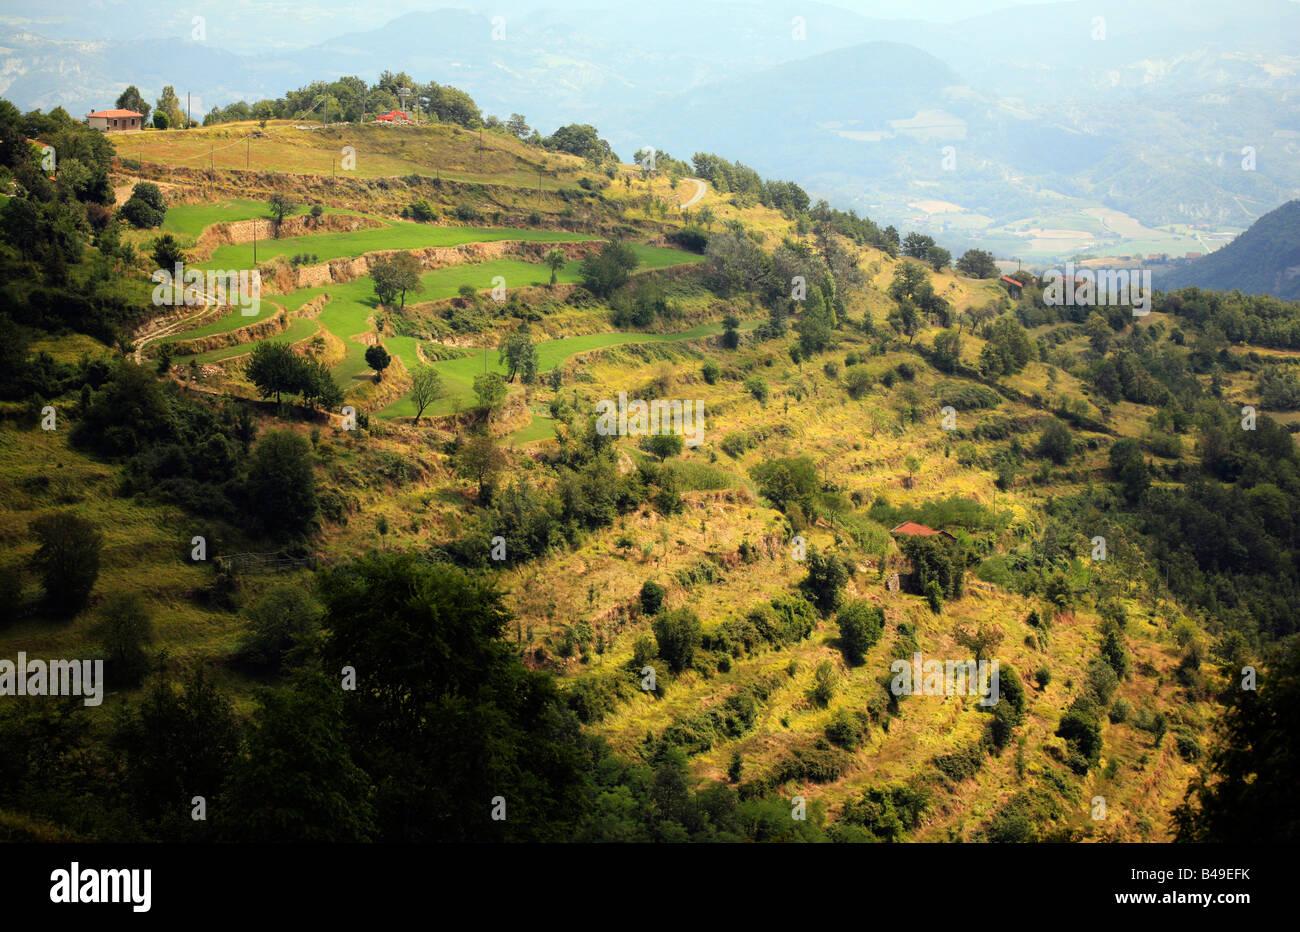 Terraced hillside in Piedmonte Italy - Stock Image